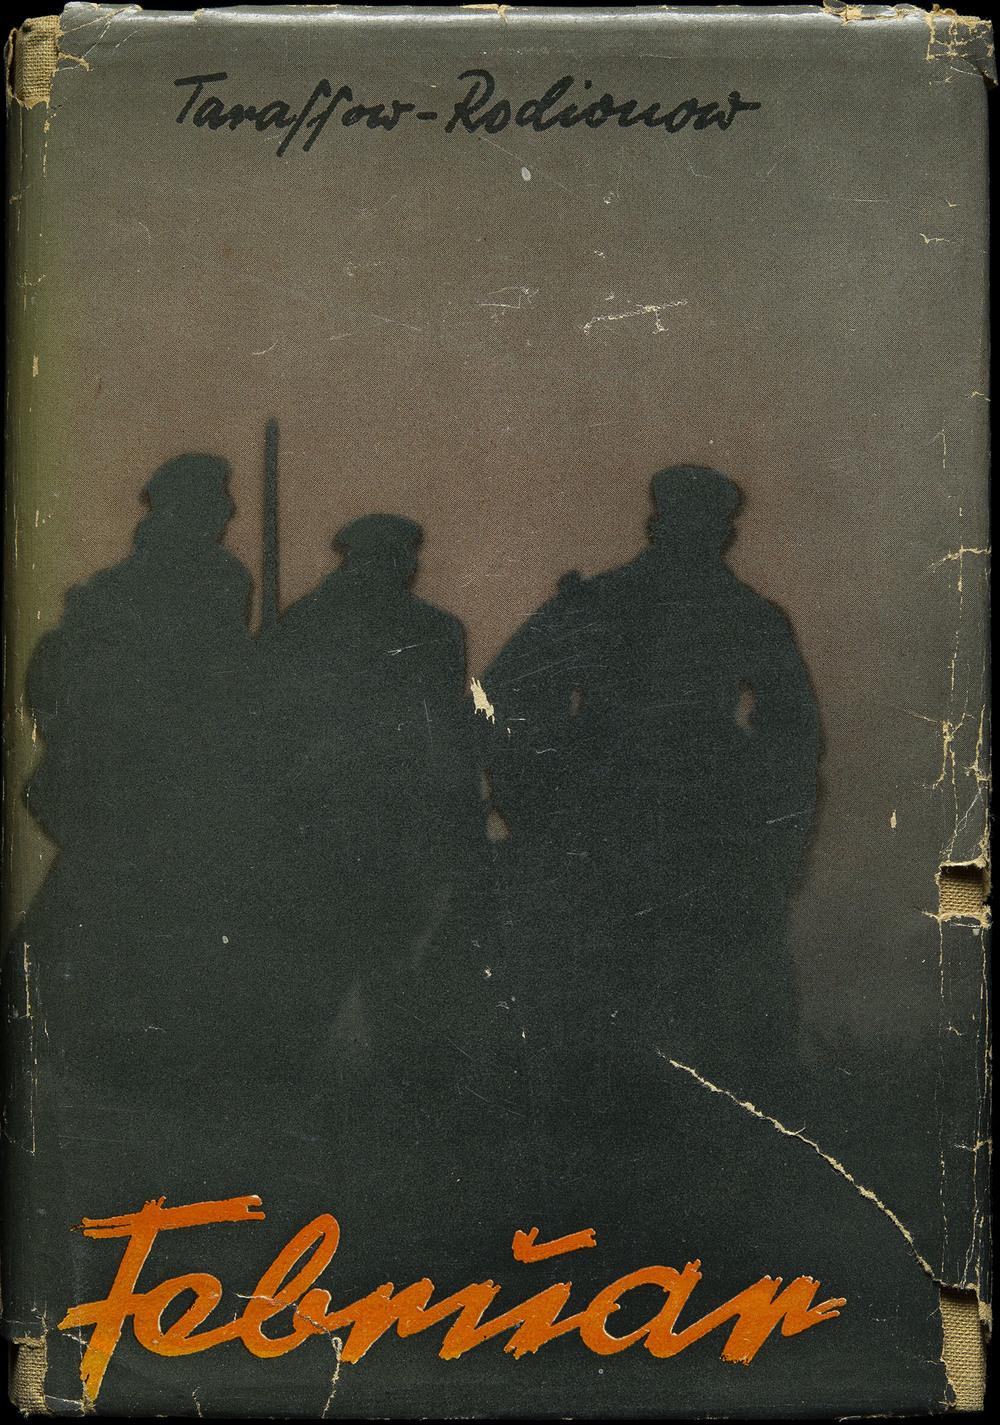 John Heartfield,  Febrüar  by Tarassow-Rodionow, Neuer Deutscher Verlag, Berlin, 1930, 13.3 x 19.2 cm